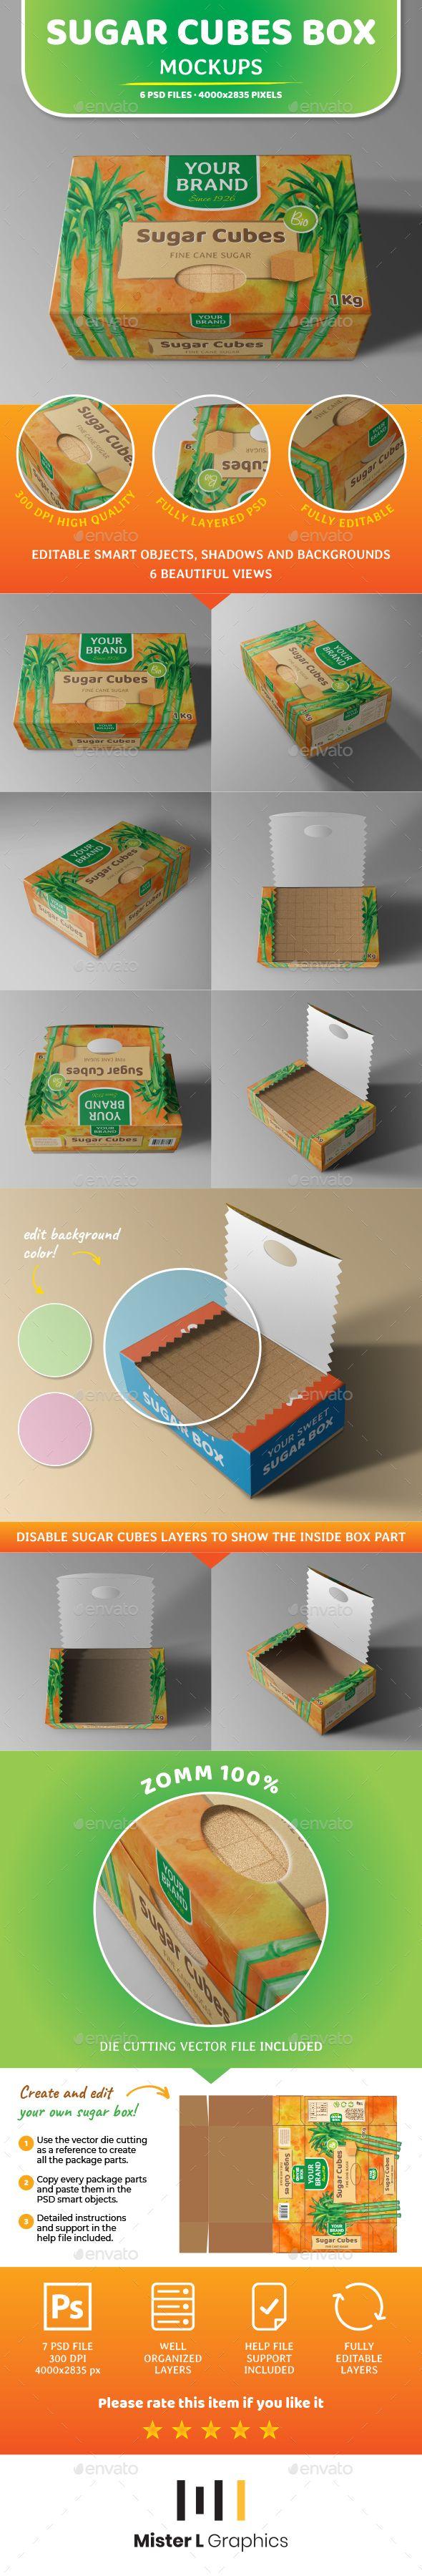 Download Box Mockup Download Here Https Graphicriver Net Item Box Mockup 22047446 Ref Ksioks Box Mockup Packaging Mockup Mockup